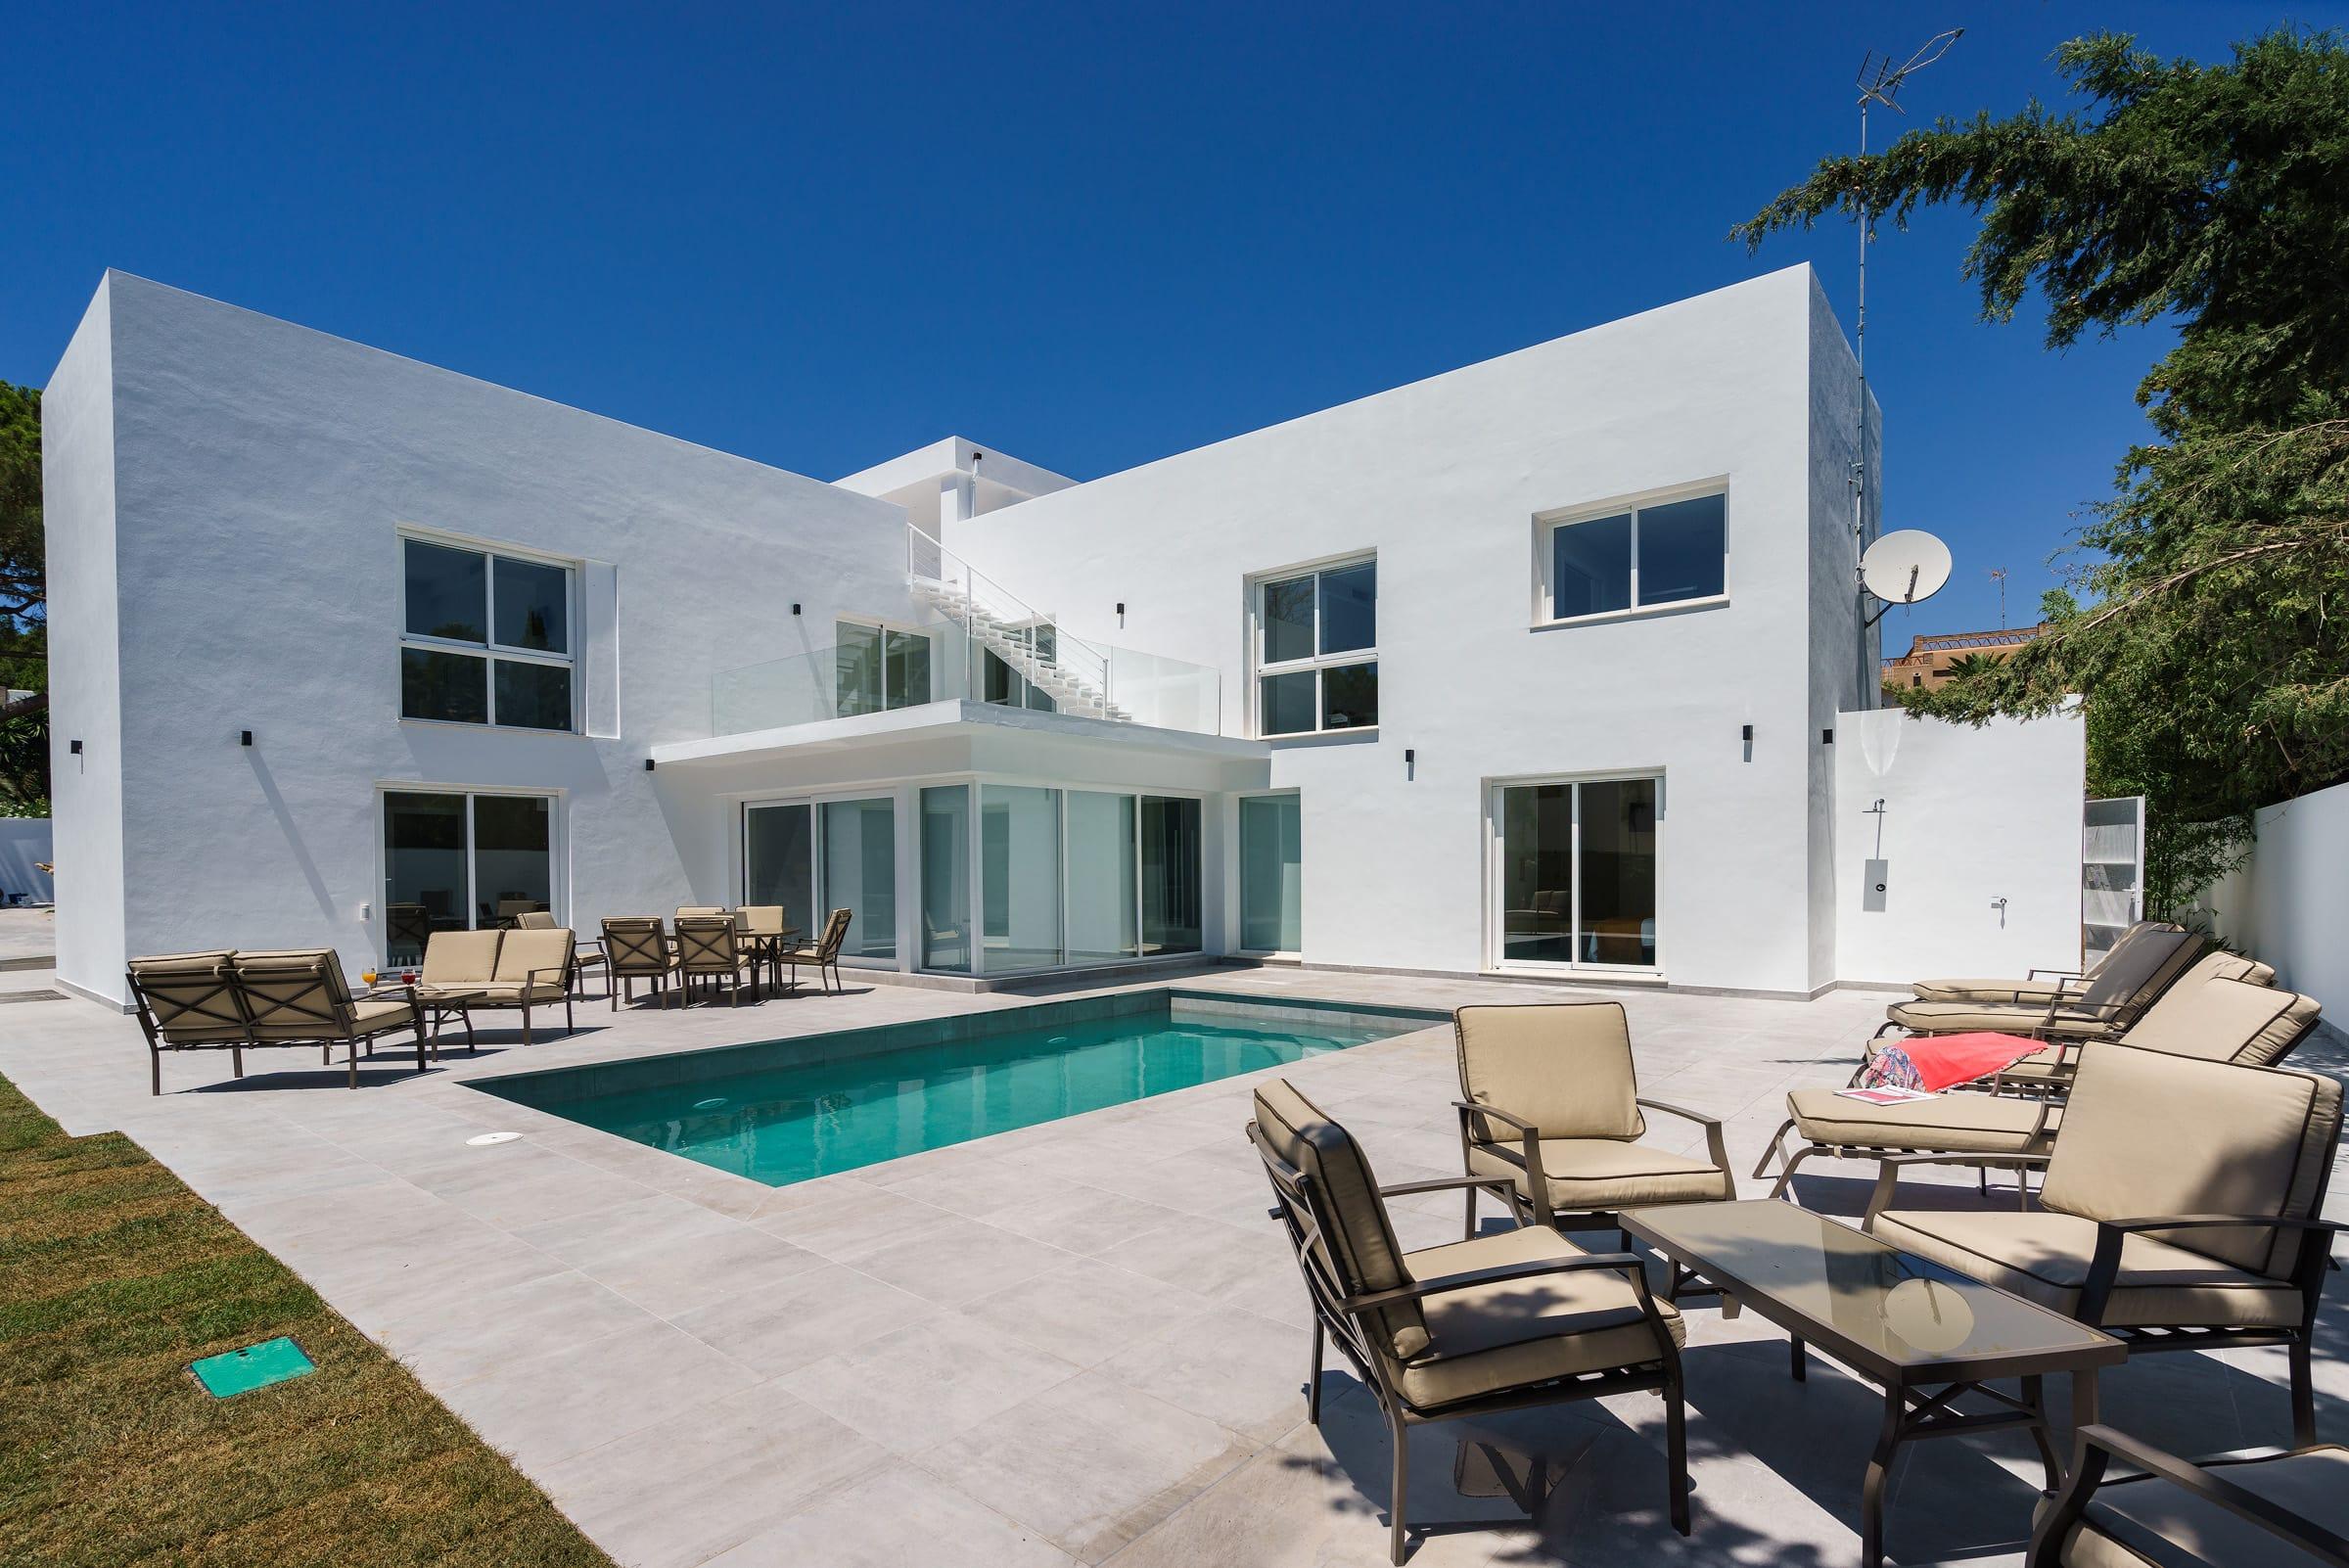 immobilier Espagne acheter un biens immobilier|www.immobilier-swiss.ch||||||||||||||||||||||||||||||||||||